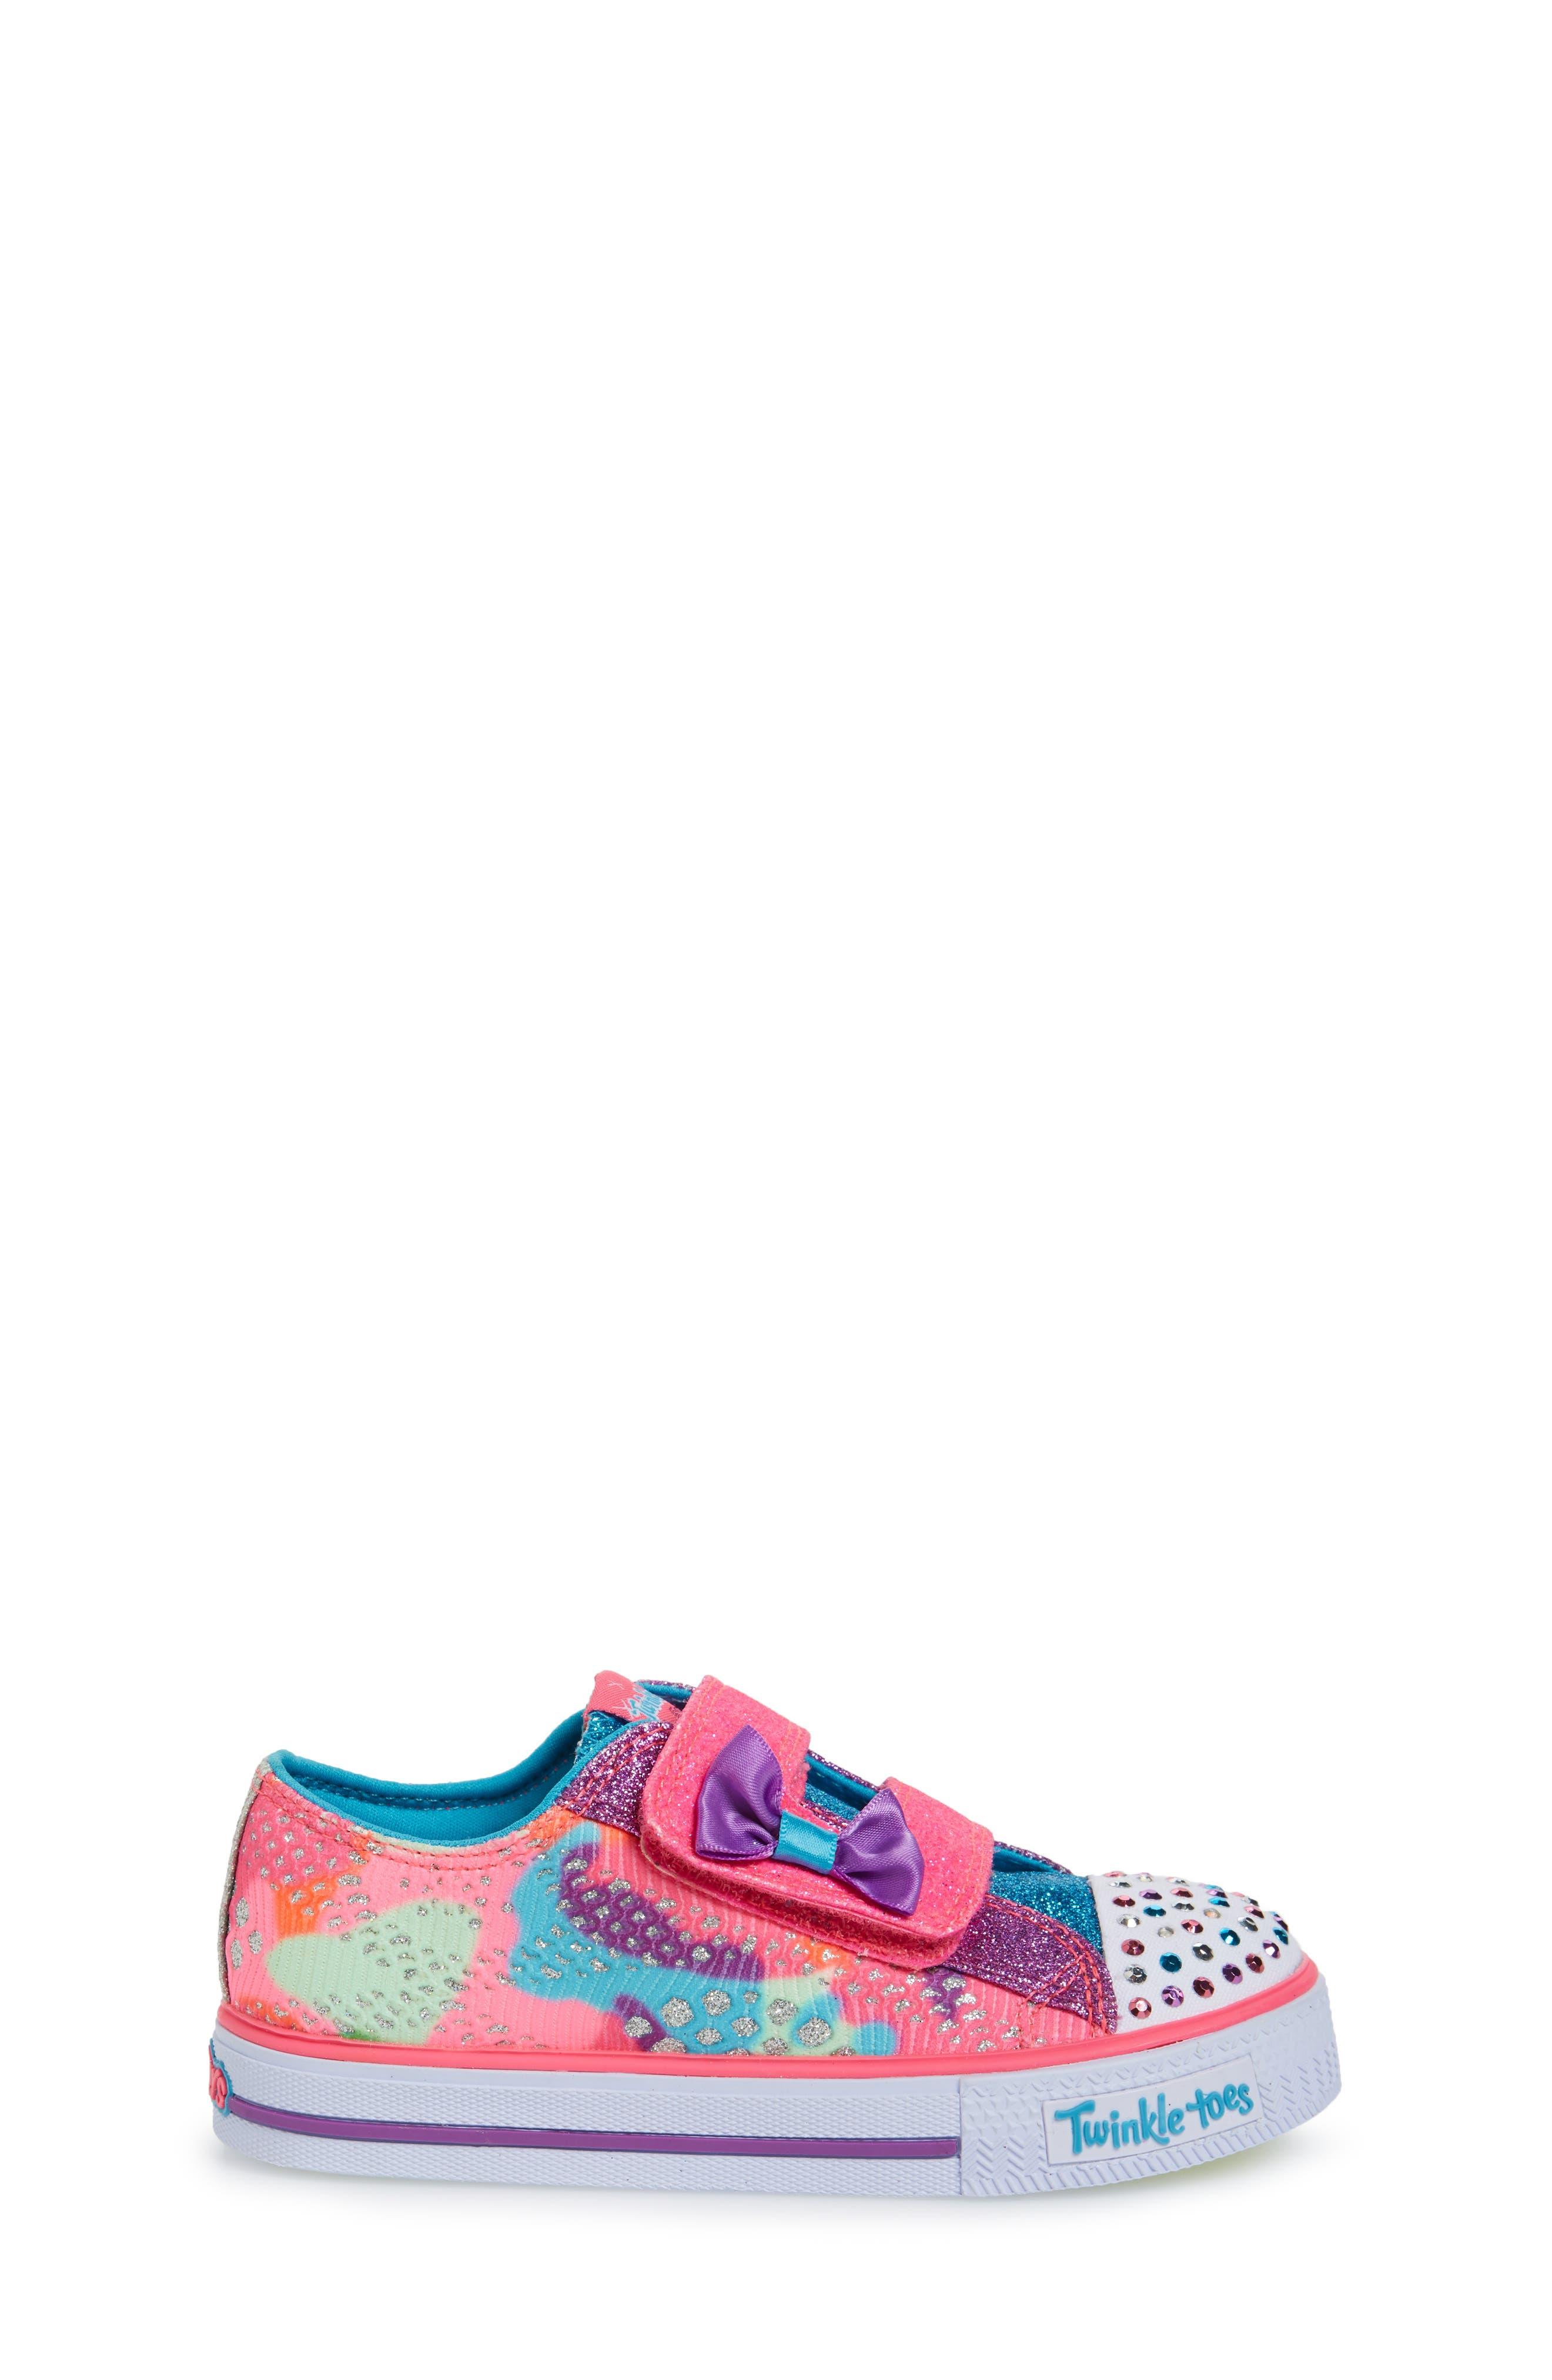 Alternate Image 3  - SKECHERS Twinkle Toes Shuffles Light-Up Sneaker (Walker & Toddler)